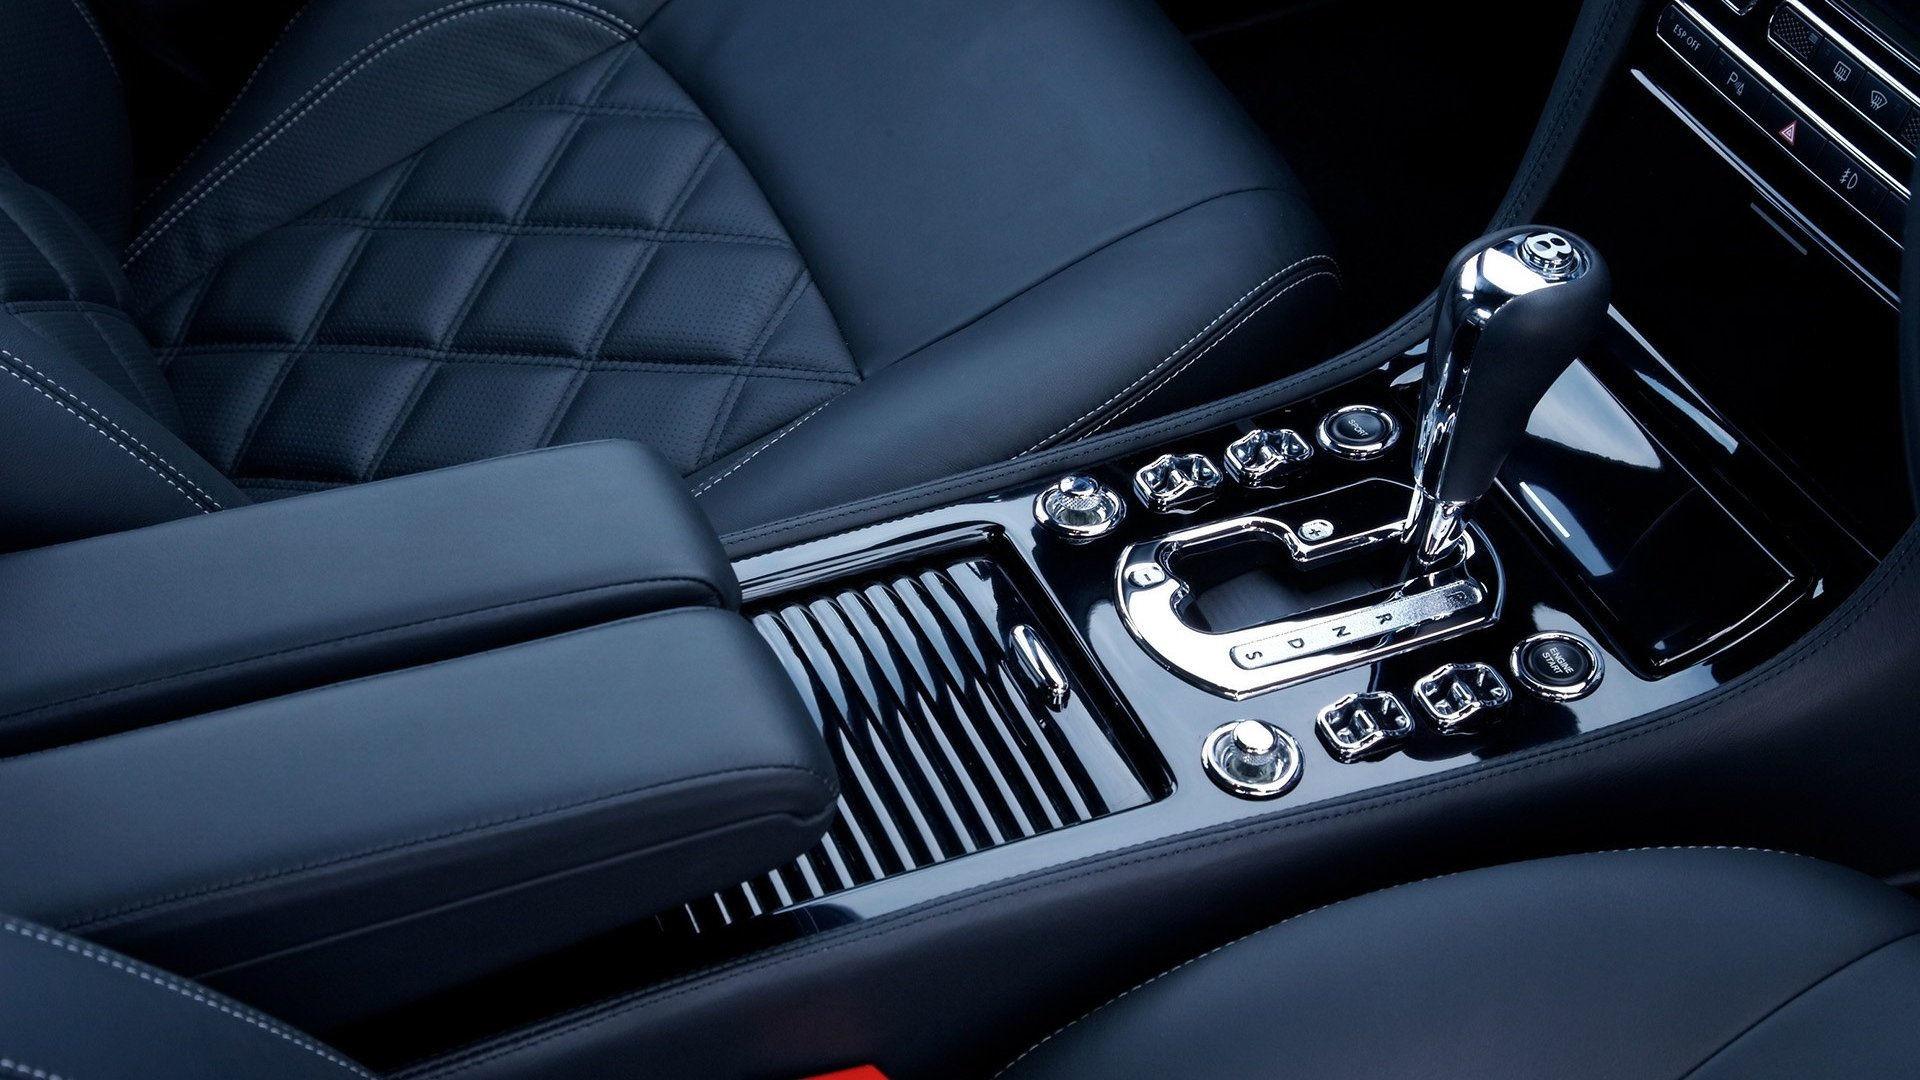 Res: 1920x1080, throttle position sensor hd car gear wallpaper